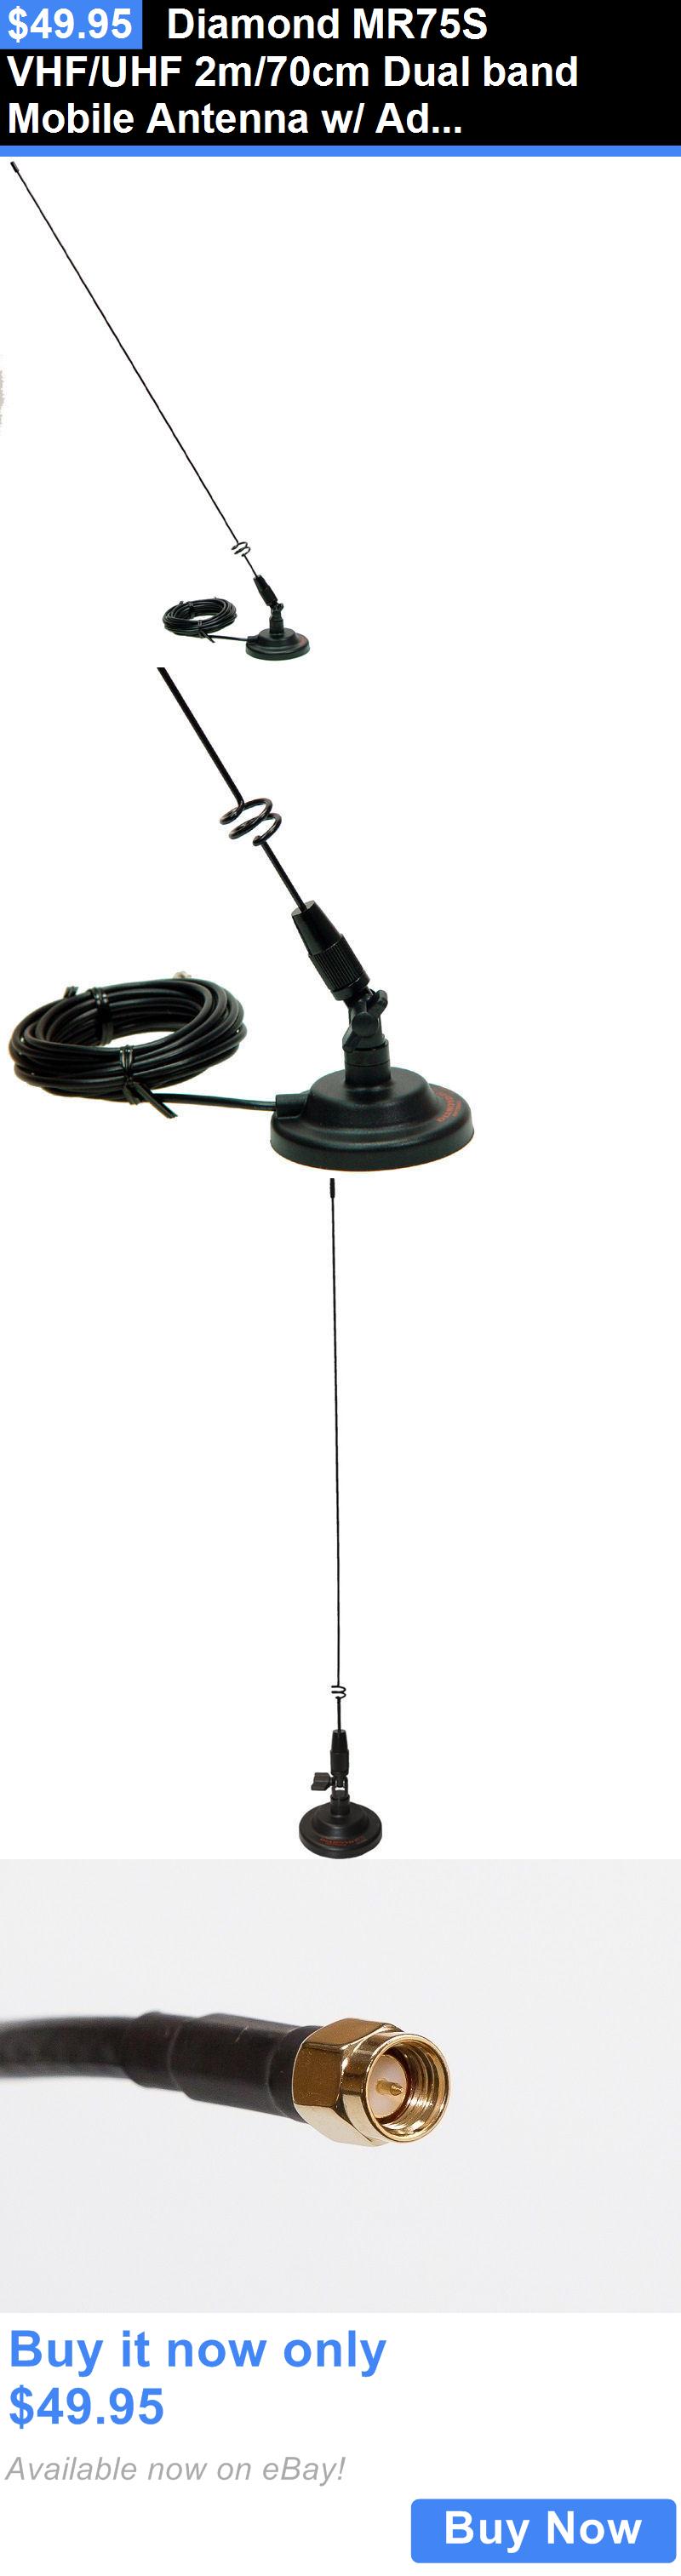 Ham Amateur Radio Antennas: Diamond Mr75s Vhf/Uhf 2M/70Cm